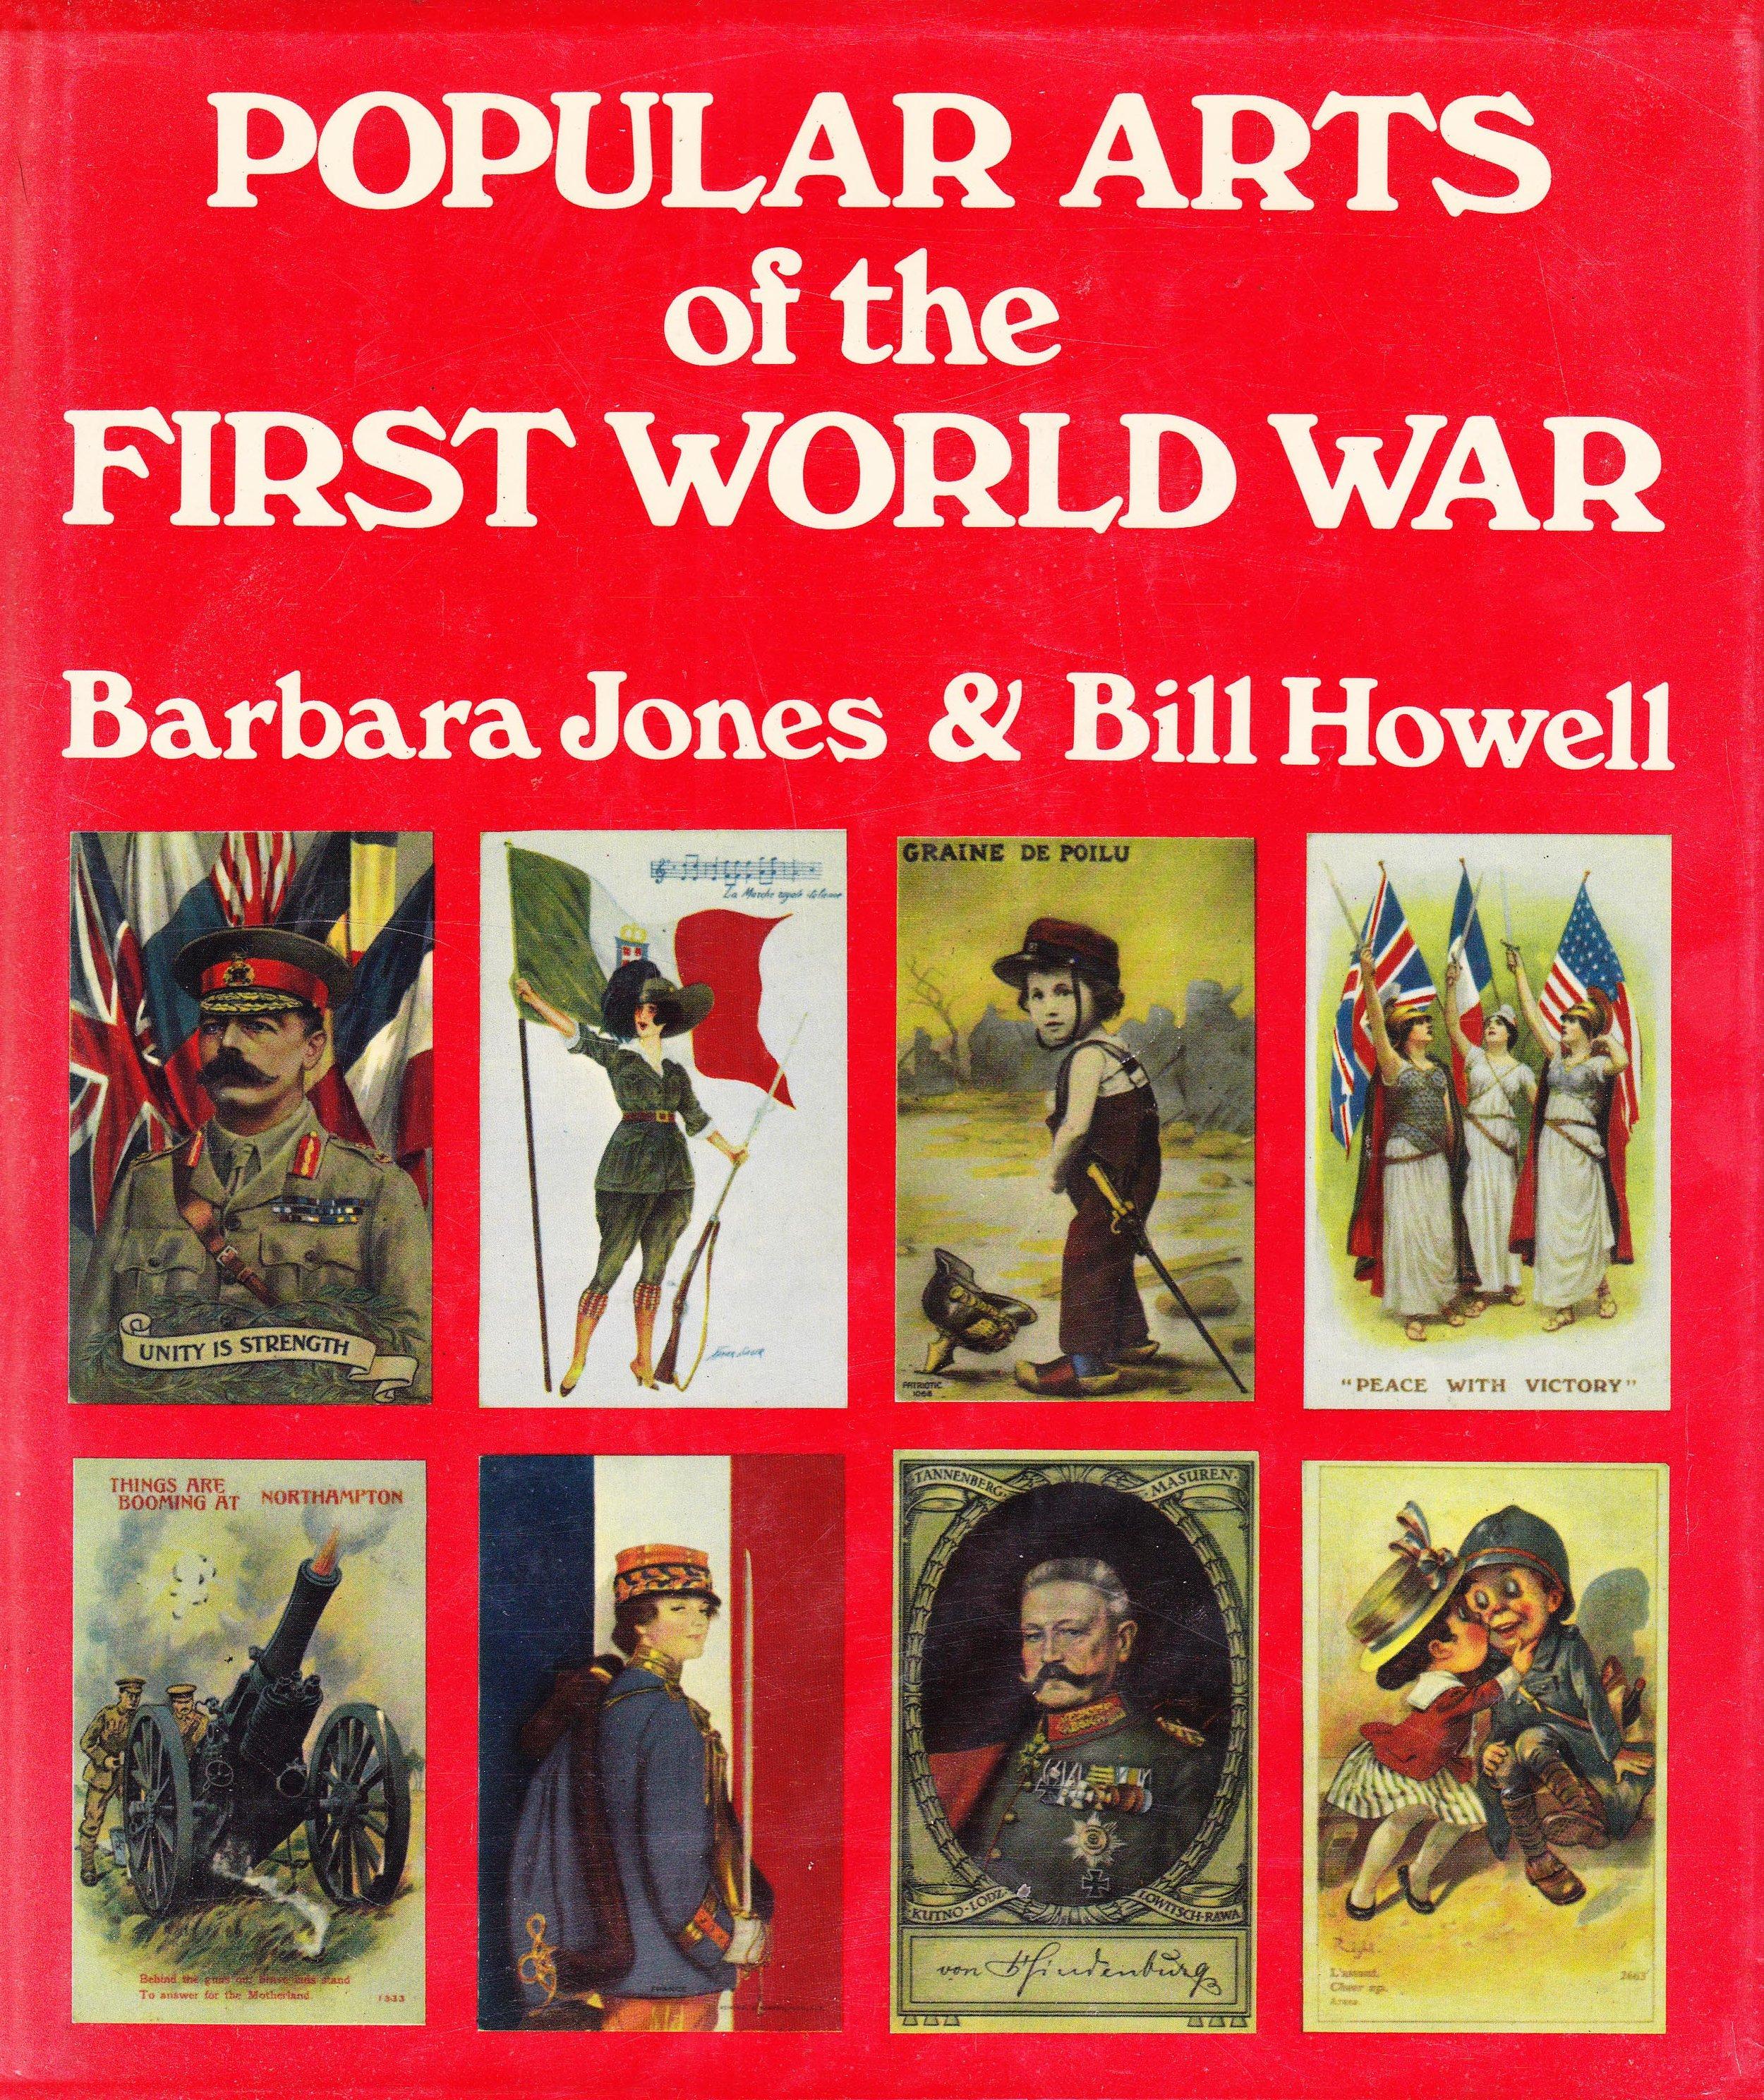 Popular Art of the First World War By Barbara Jones & Bill Howell.jpg